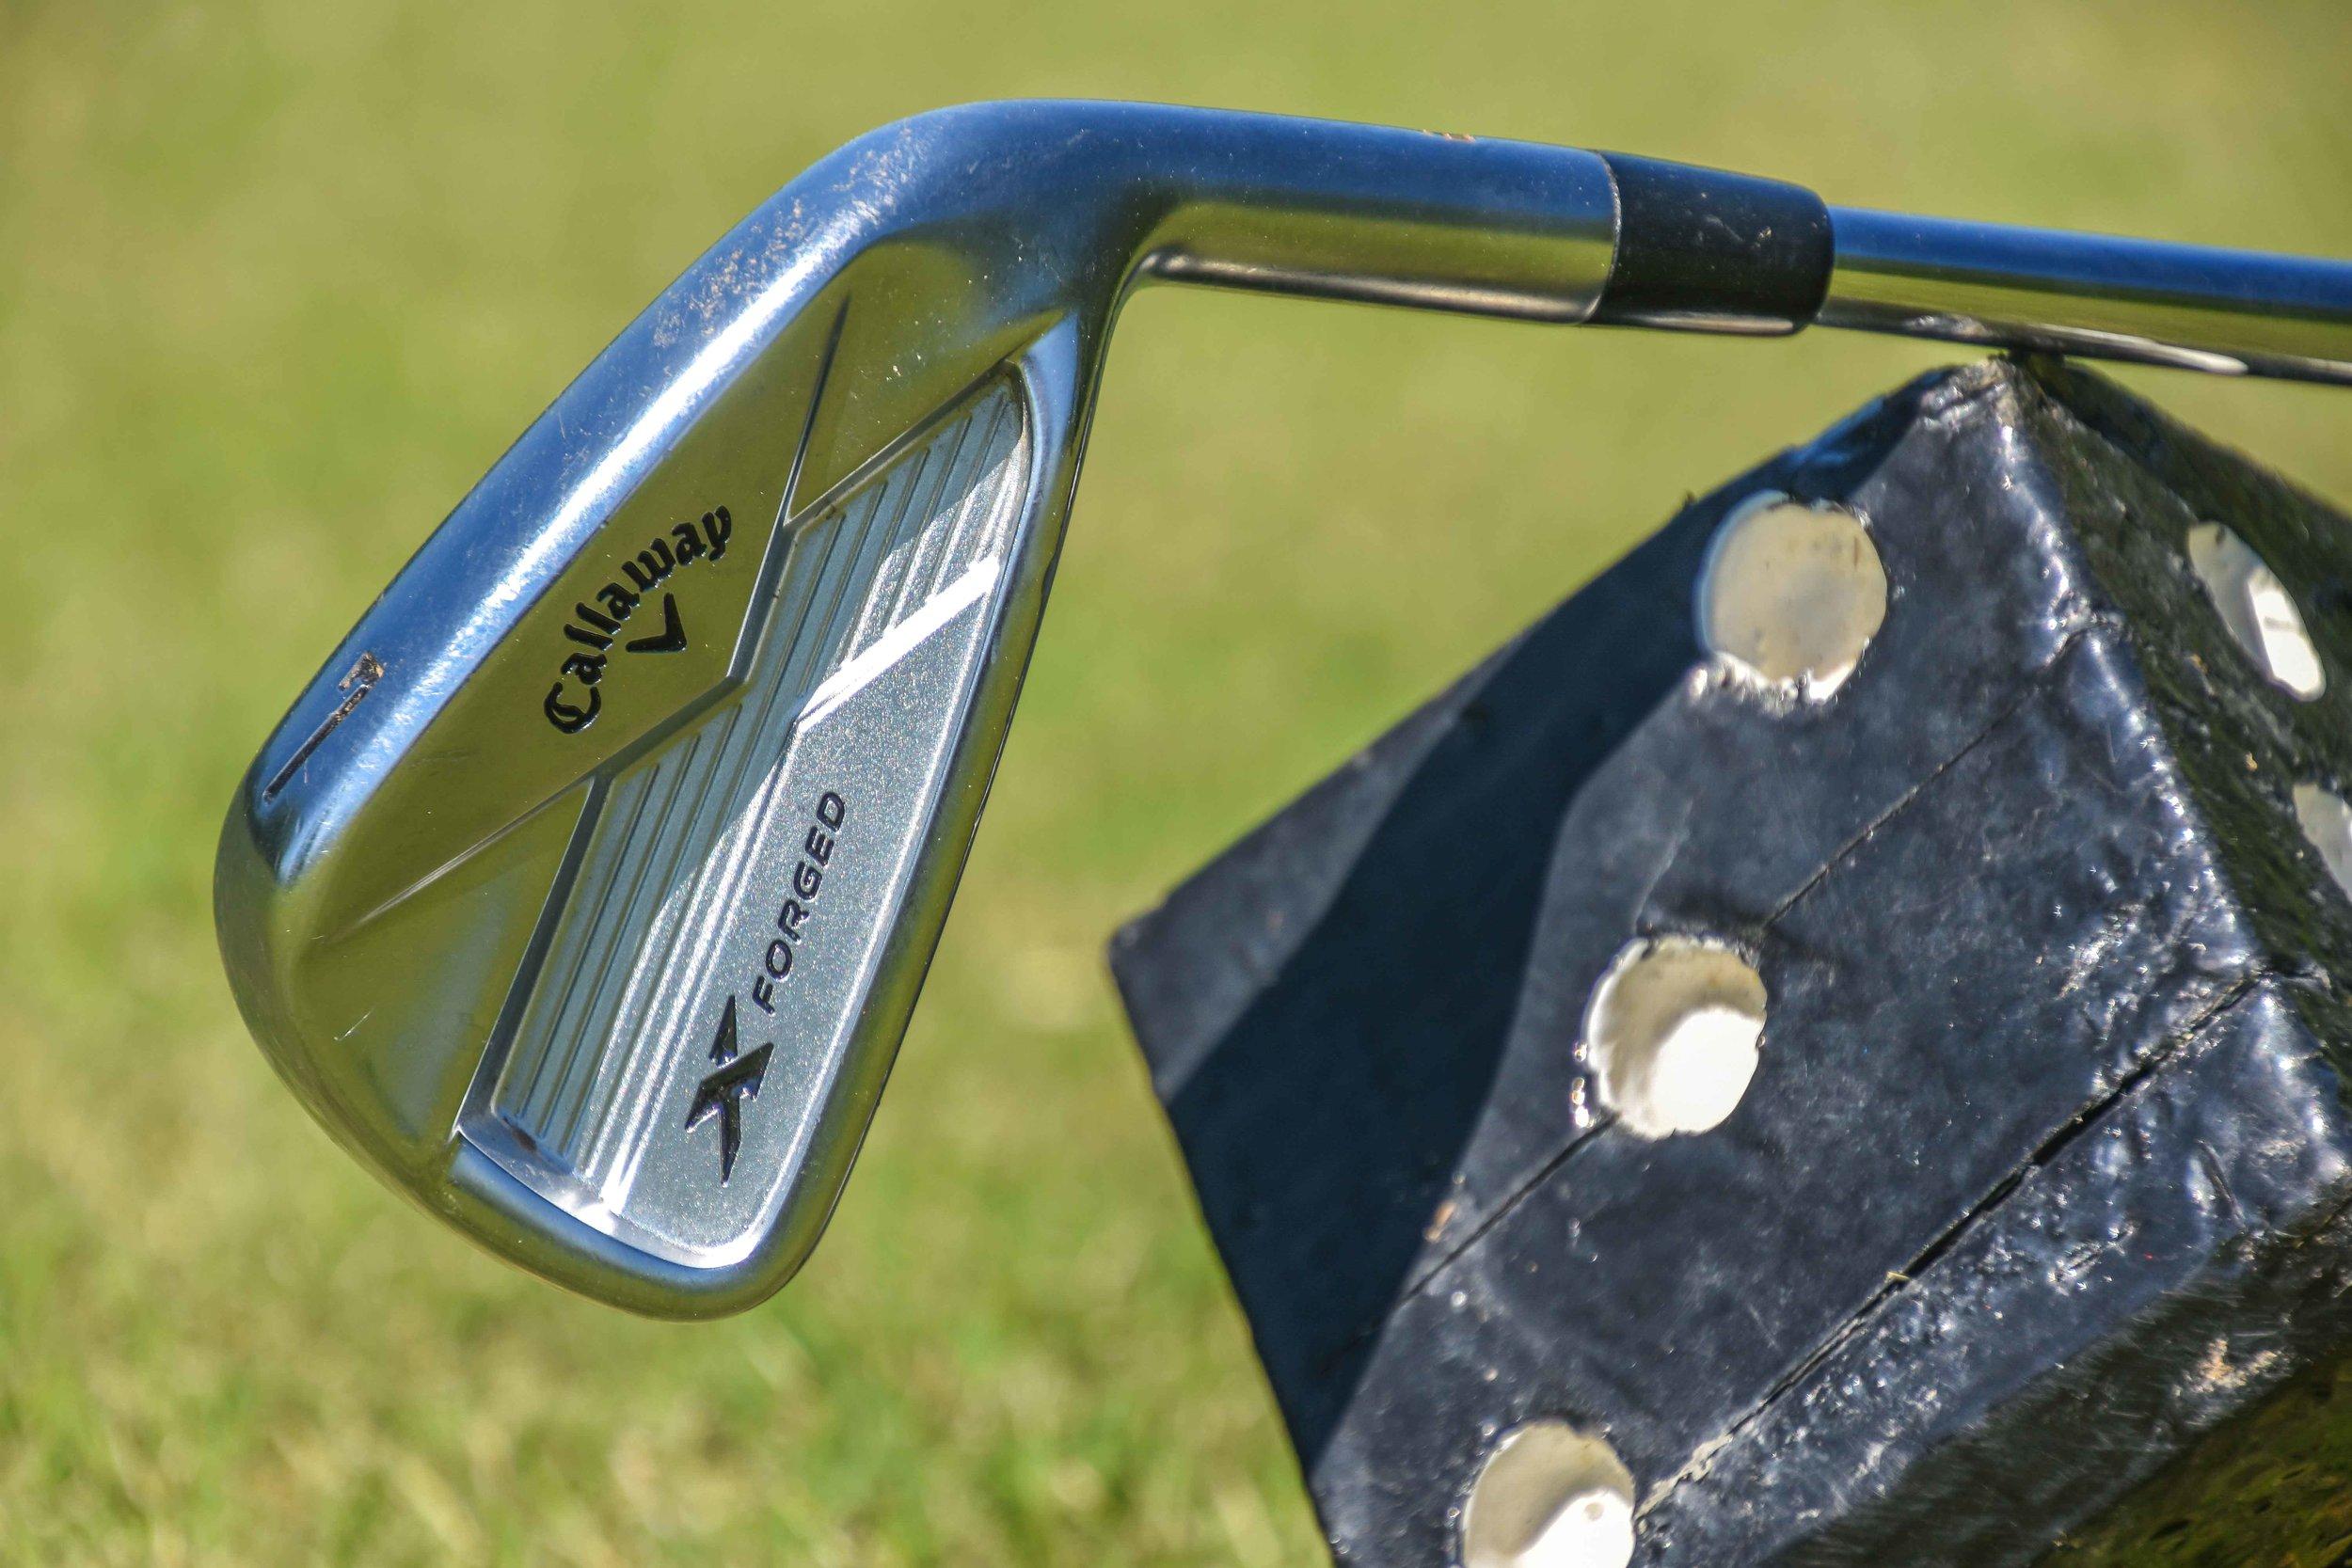 Koasati Pines Golf Club1-34.jpg